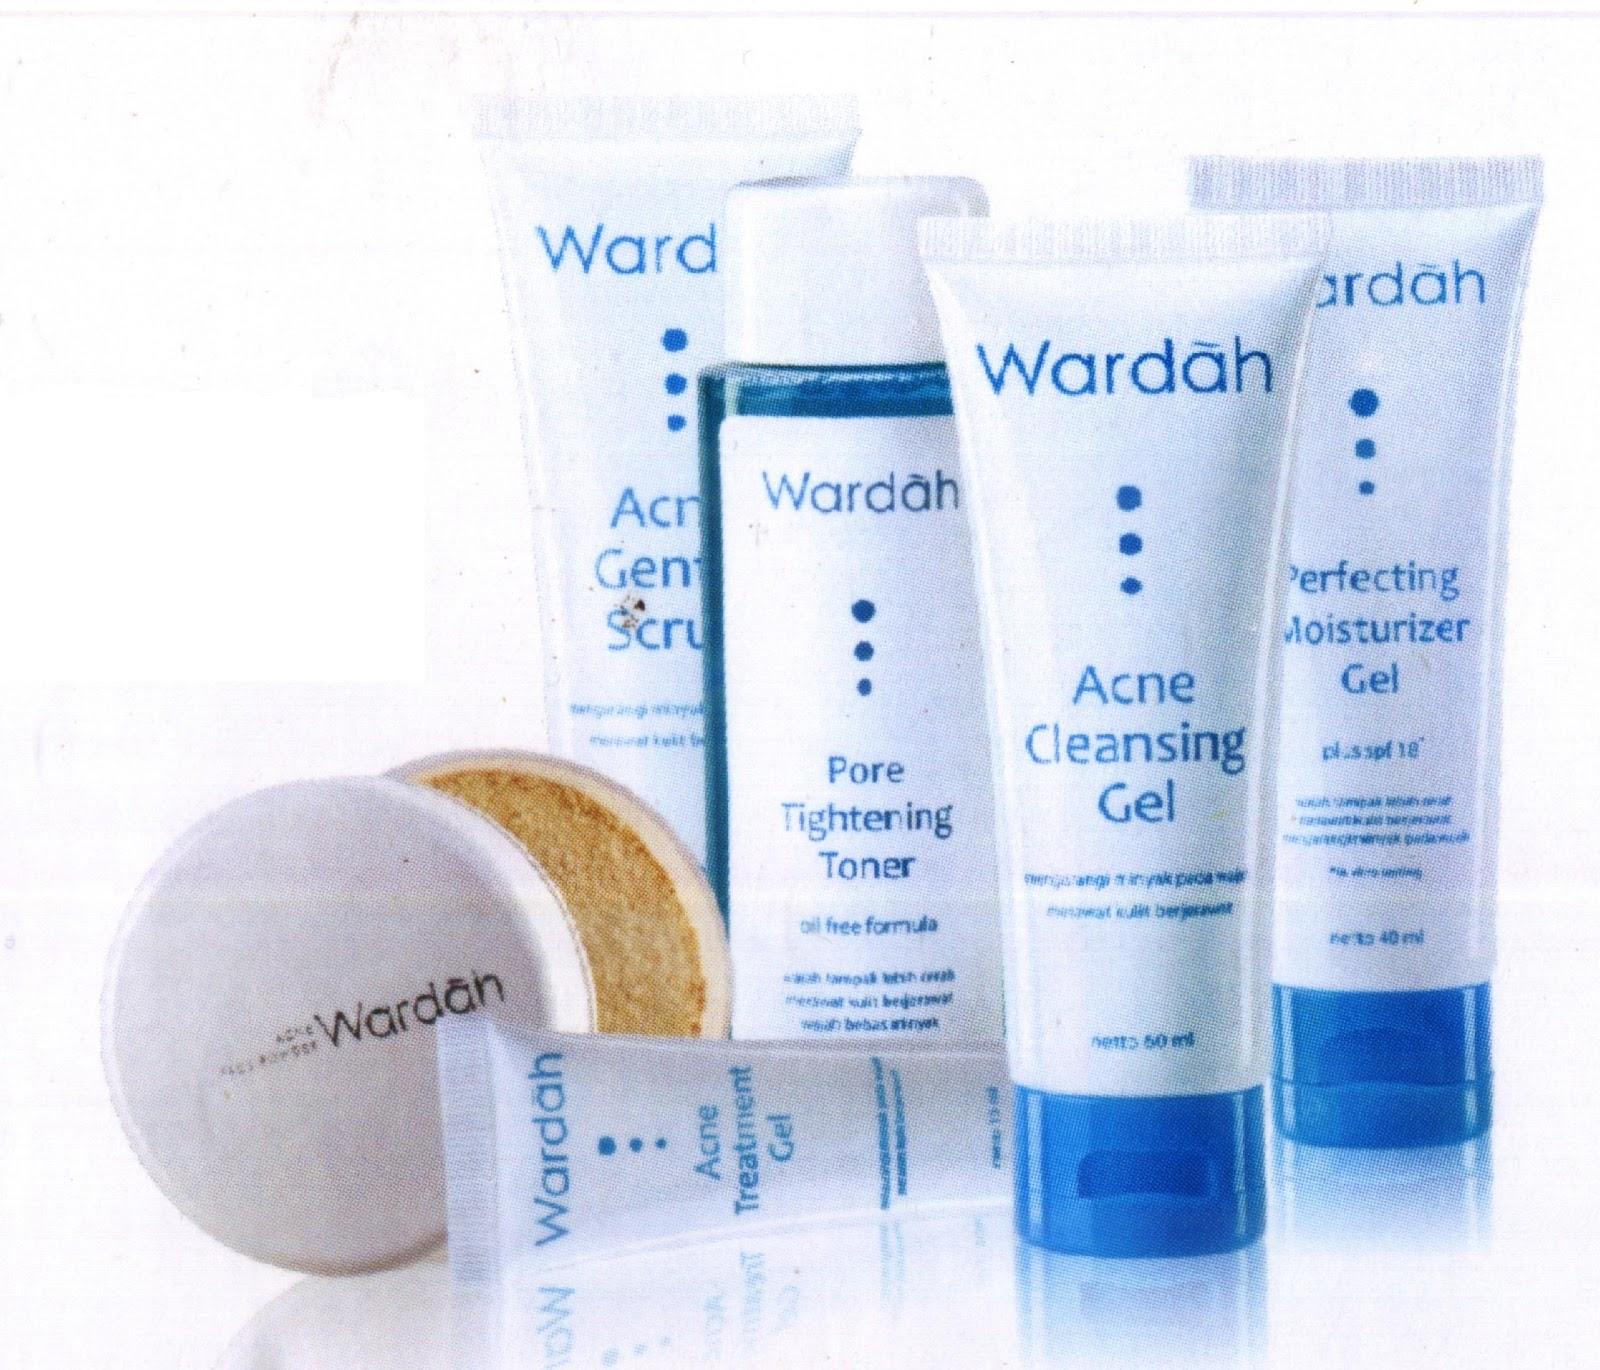 Wardah Inspiring Beauty: Paket Wardah Acne Series